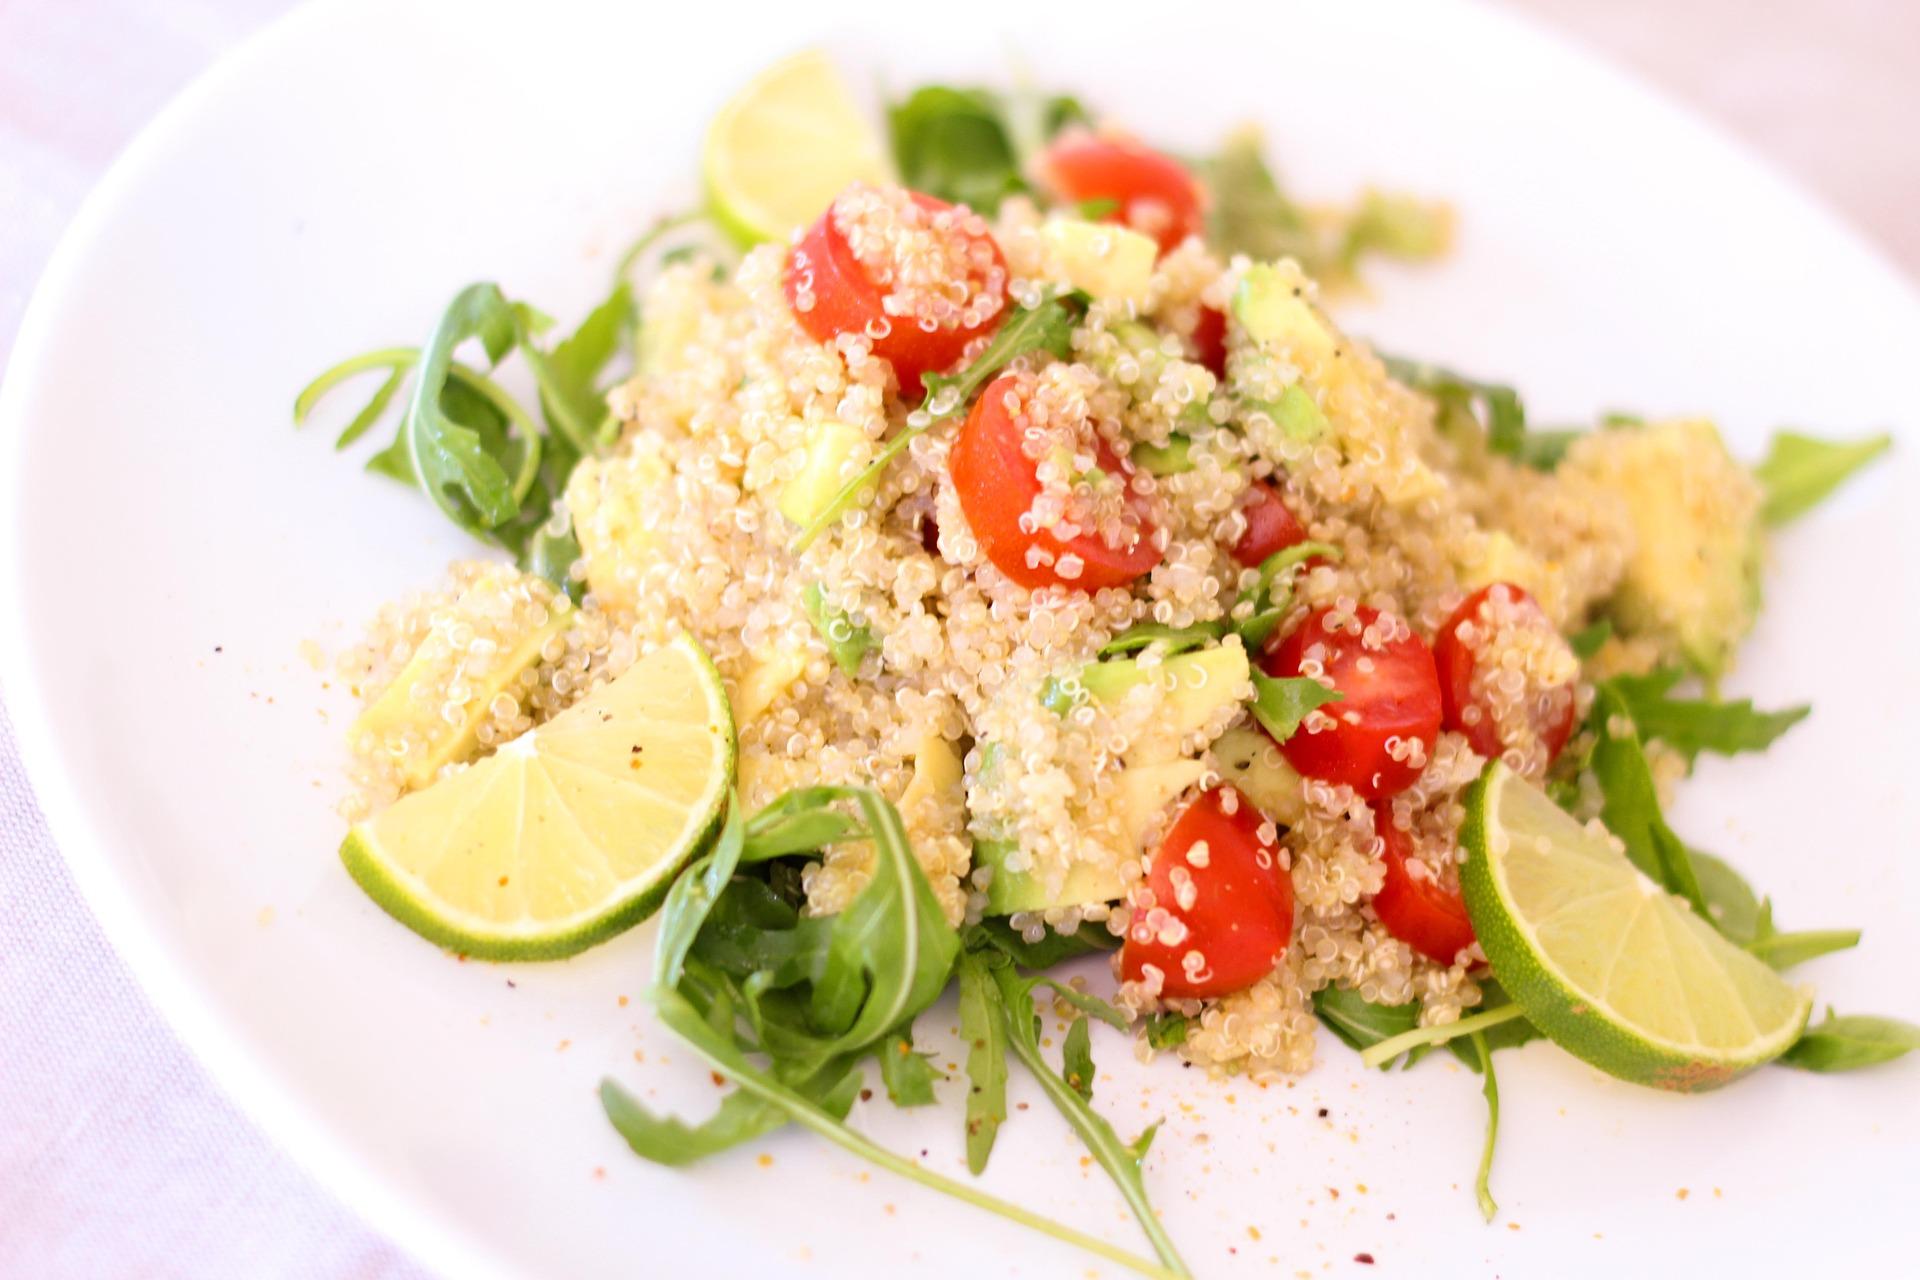 La quinoa es un alimento permitido en la dieta FODMAP. (Bernadette Wurzinger / Pixabay)